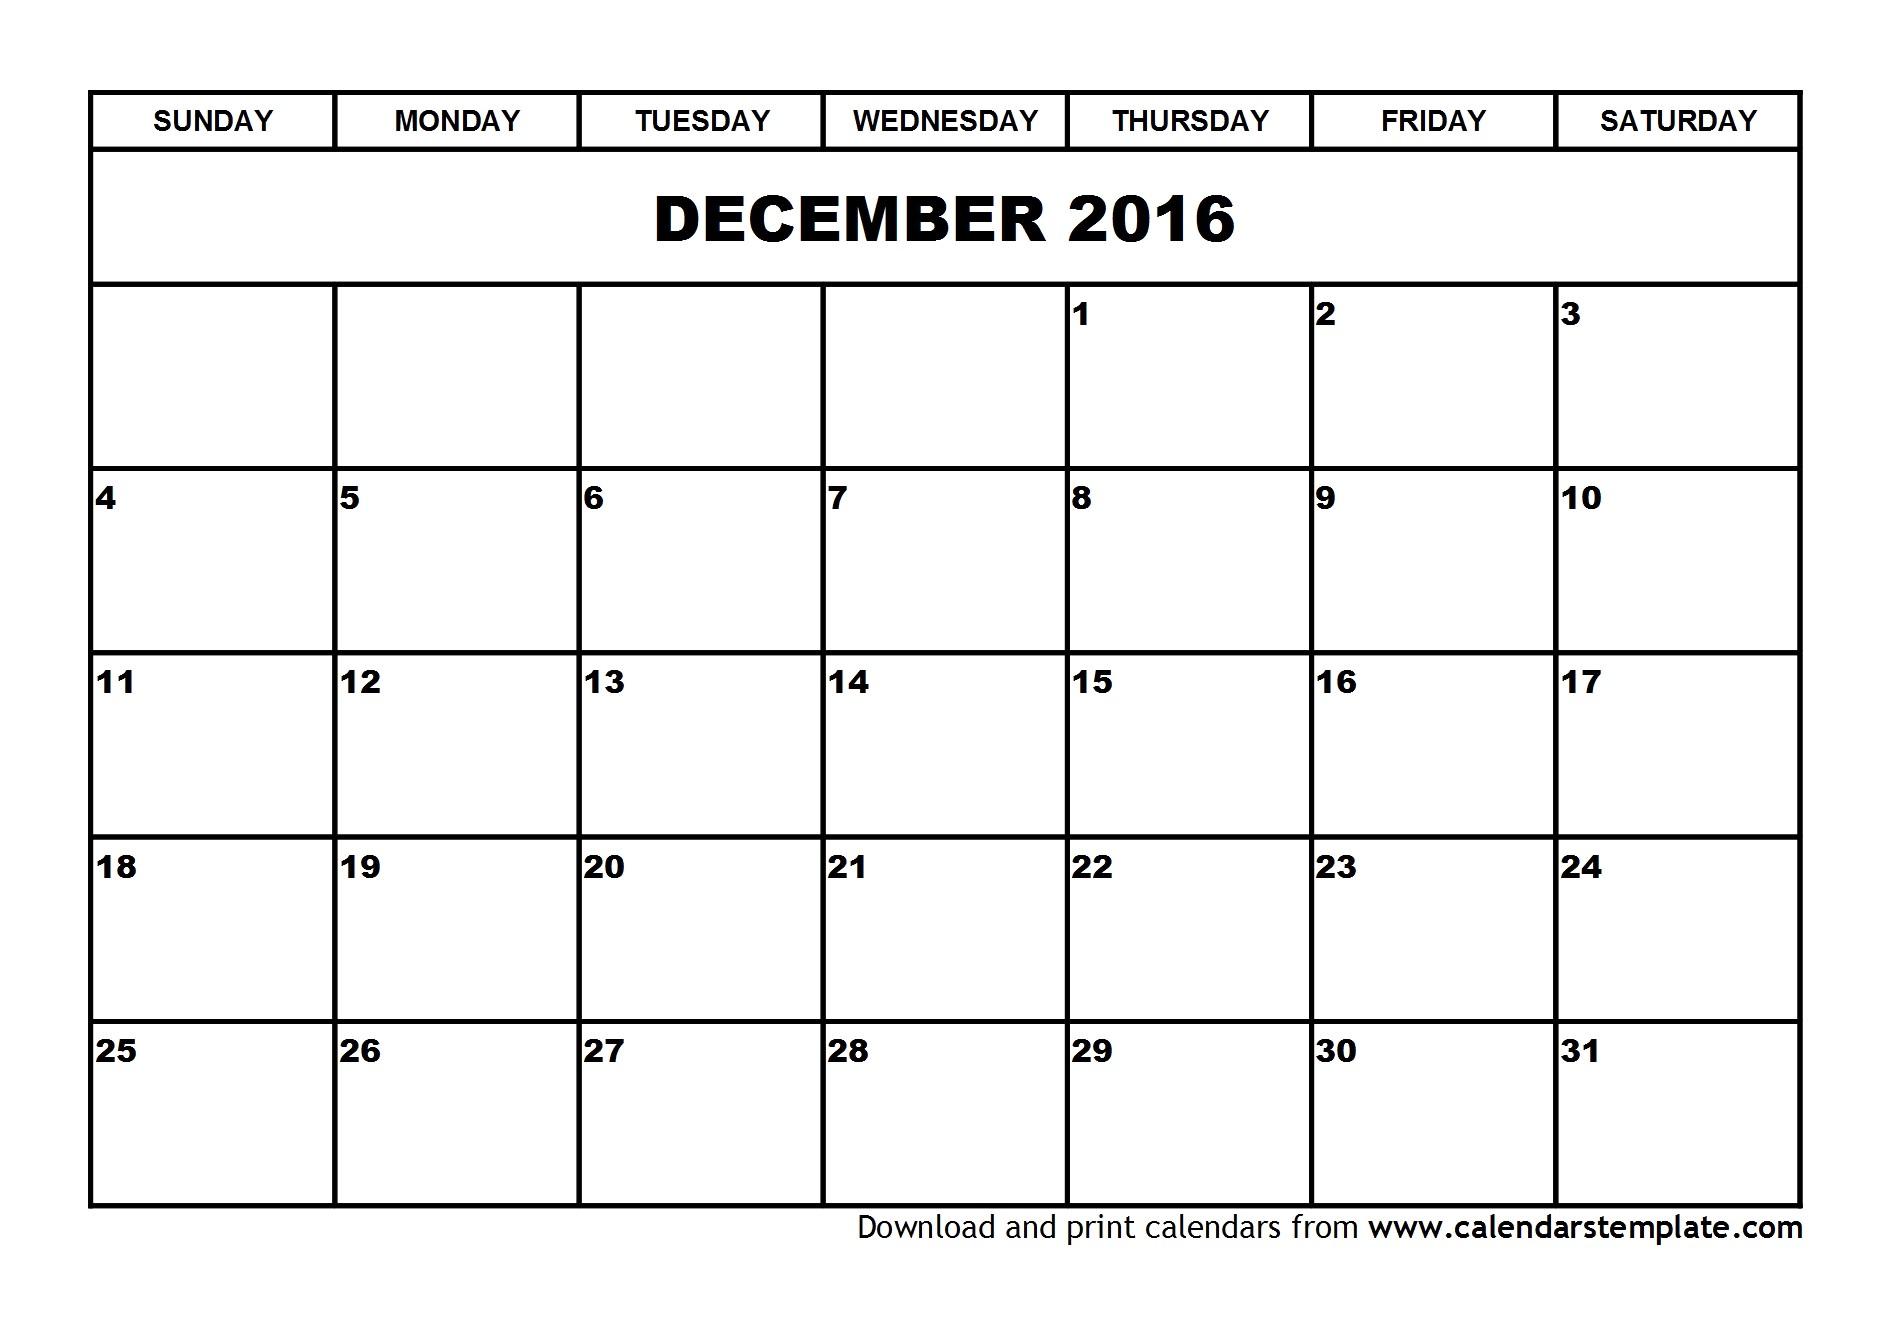 Free Printable December Calendar 2016 | Jcreview in Blank December Calendar Printable